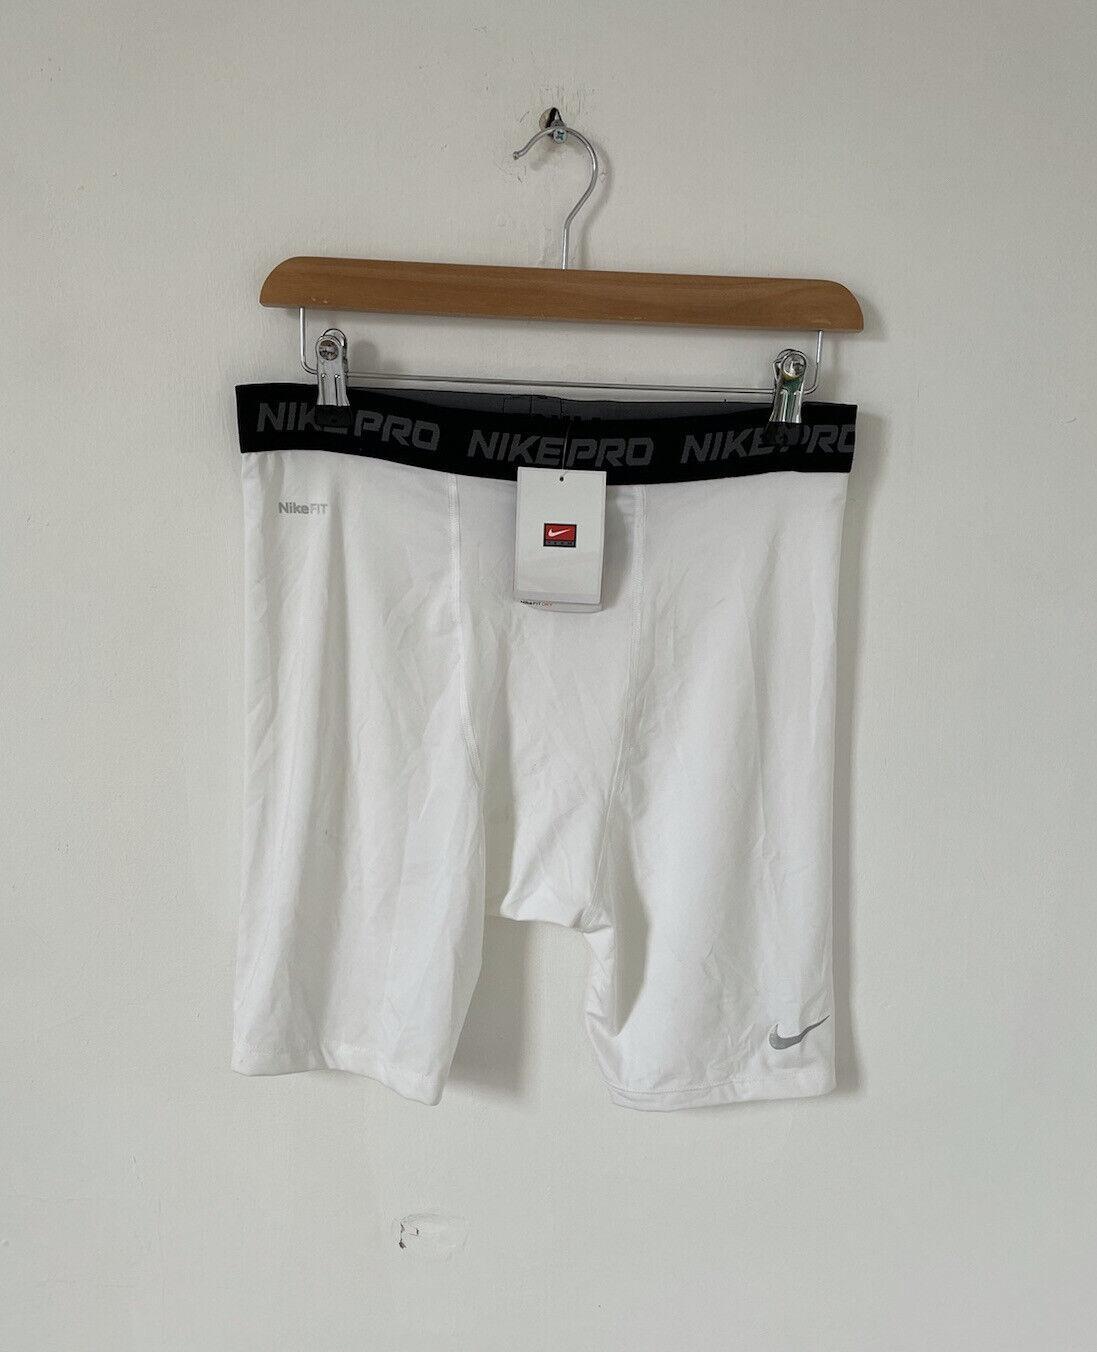 NEW Nike Pro Tight White Shorts Football Active Workout Size XL